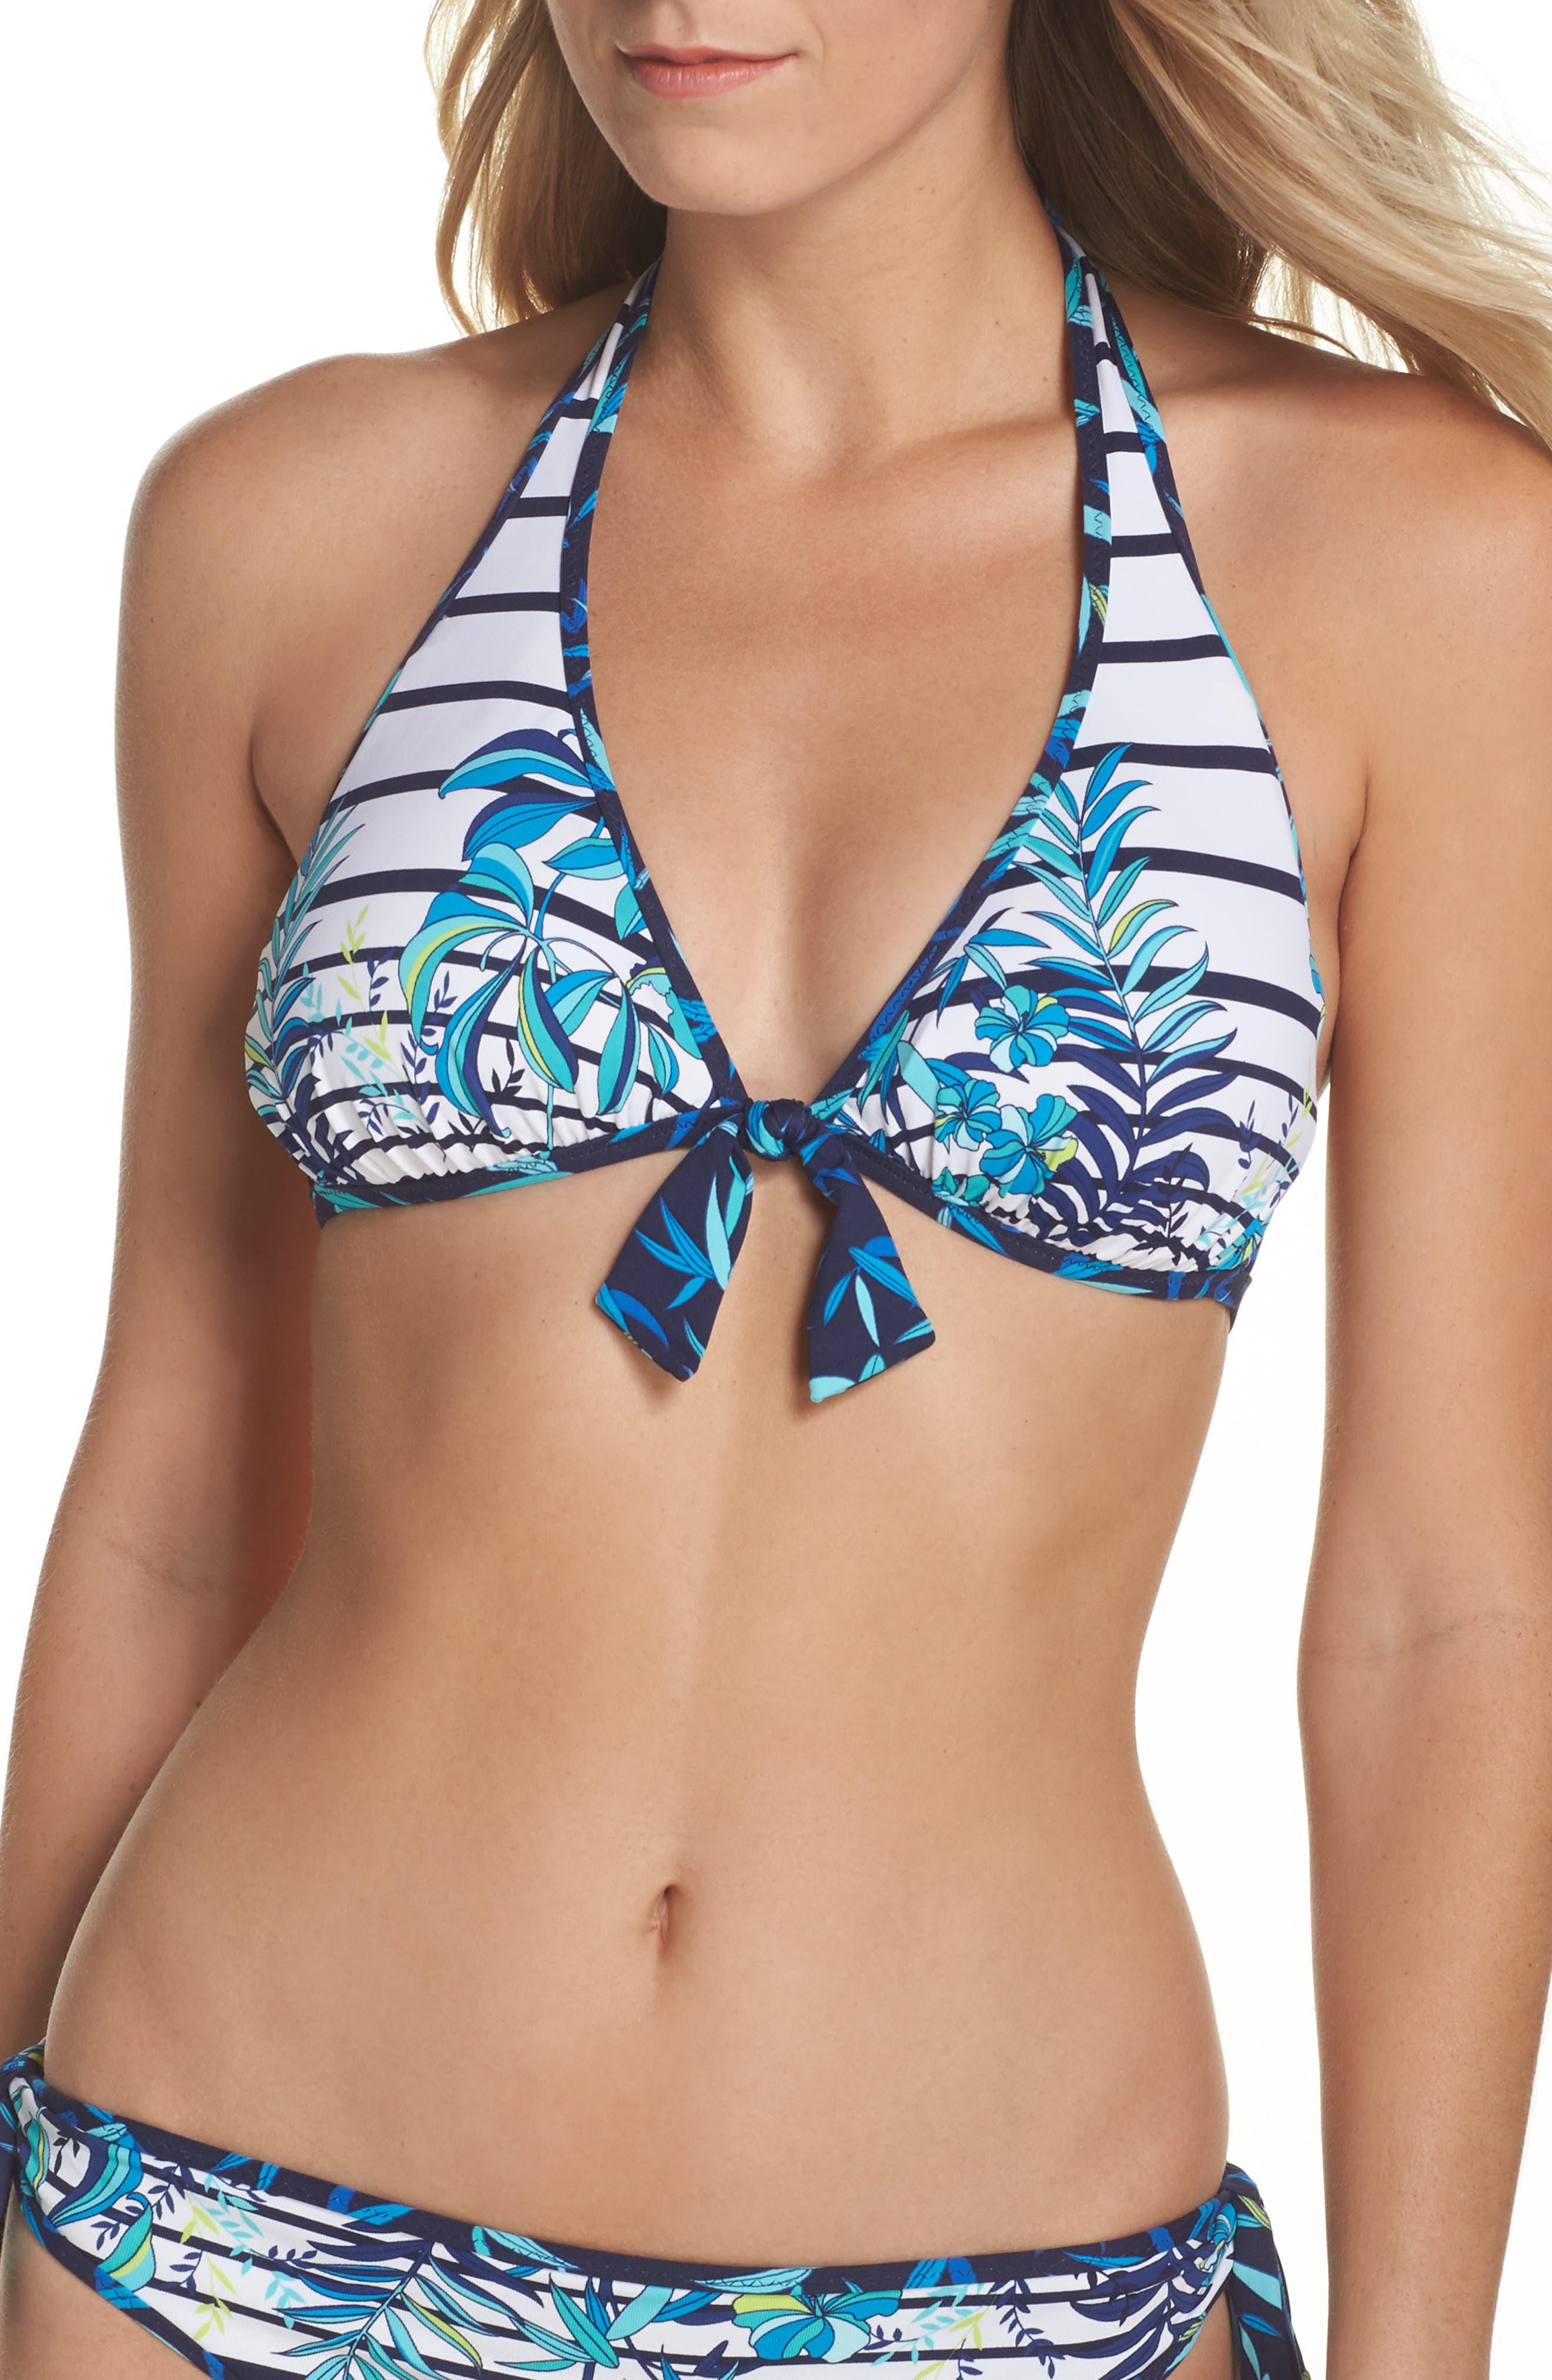 Tropical Swirl Reversible Halter Bikini Top,                             Main thumbnail 1, color,                             Blue/ White